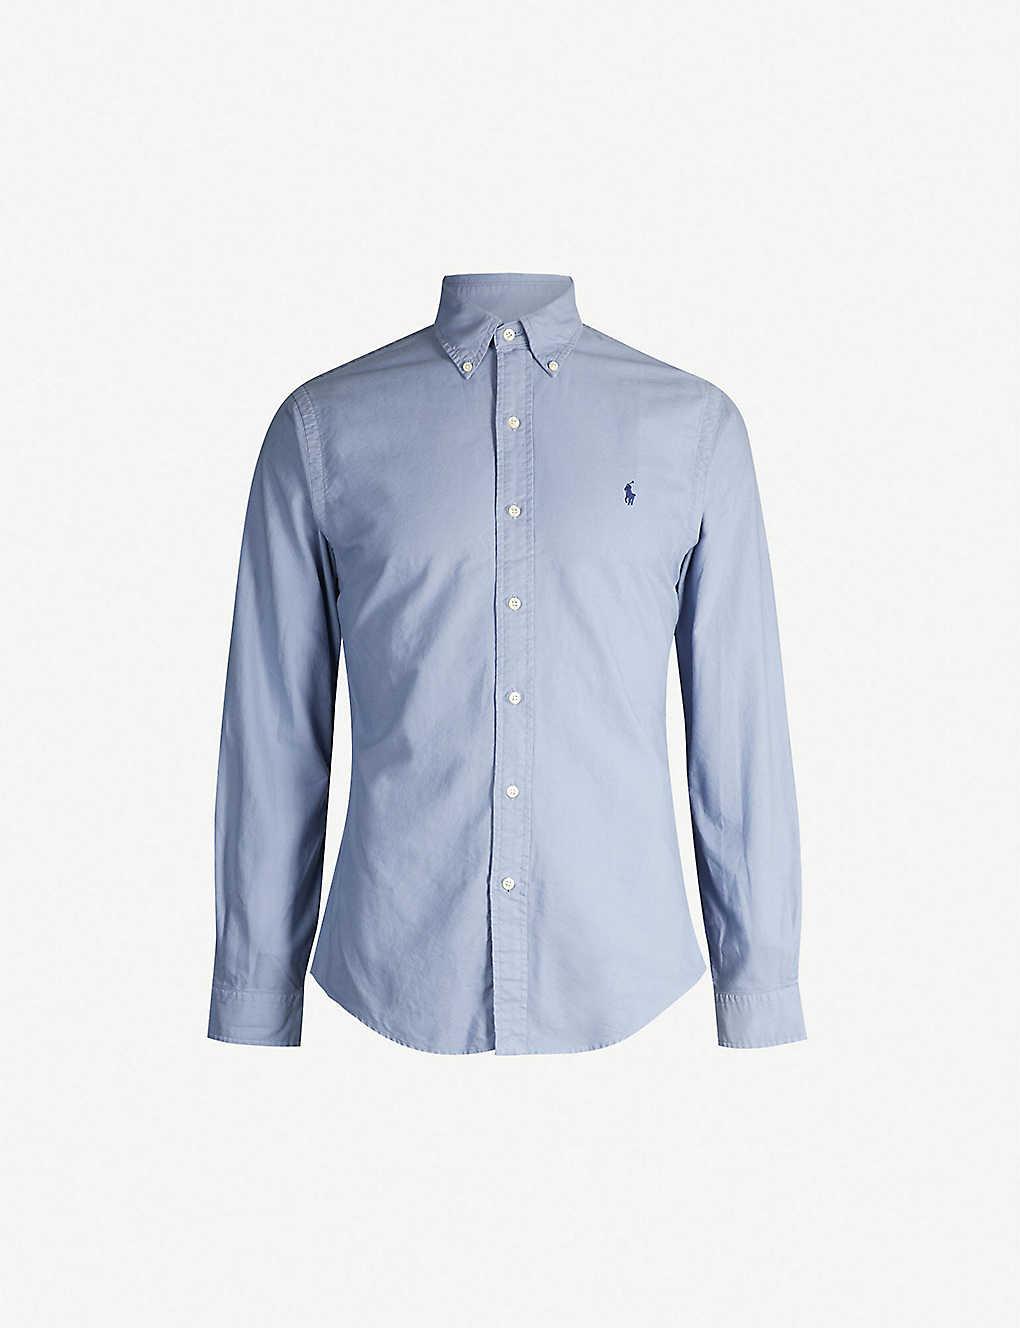 6d88c243 POLO RALPH LAUREN - Logo-embroidered slim-fit cotton shirt ...